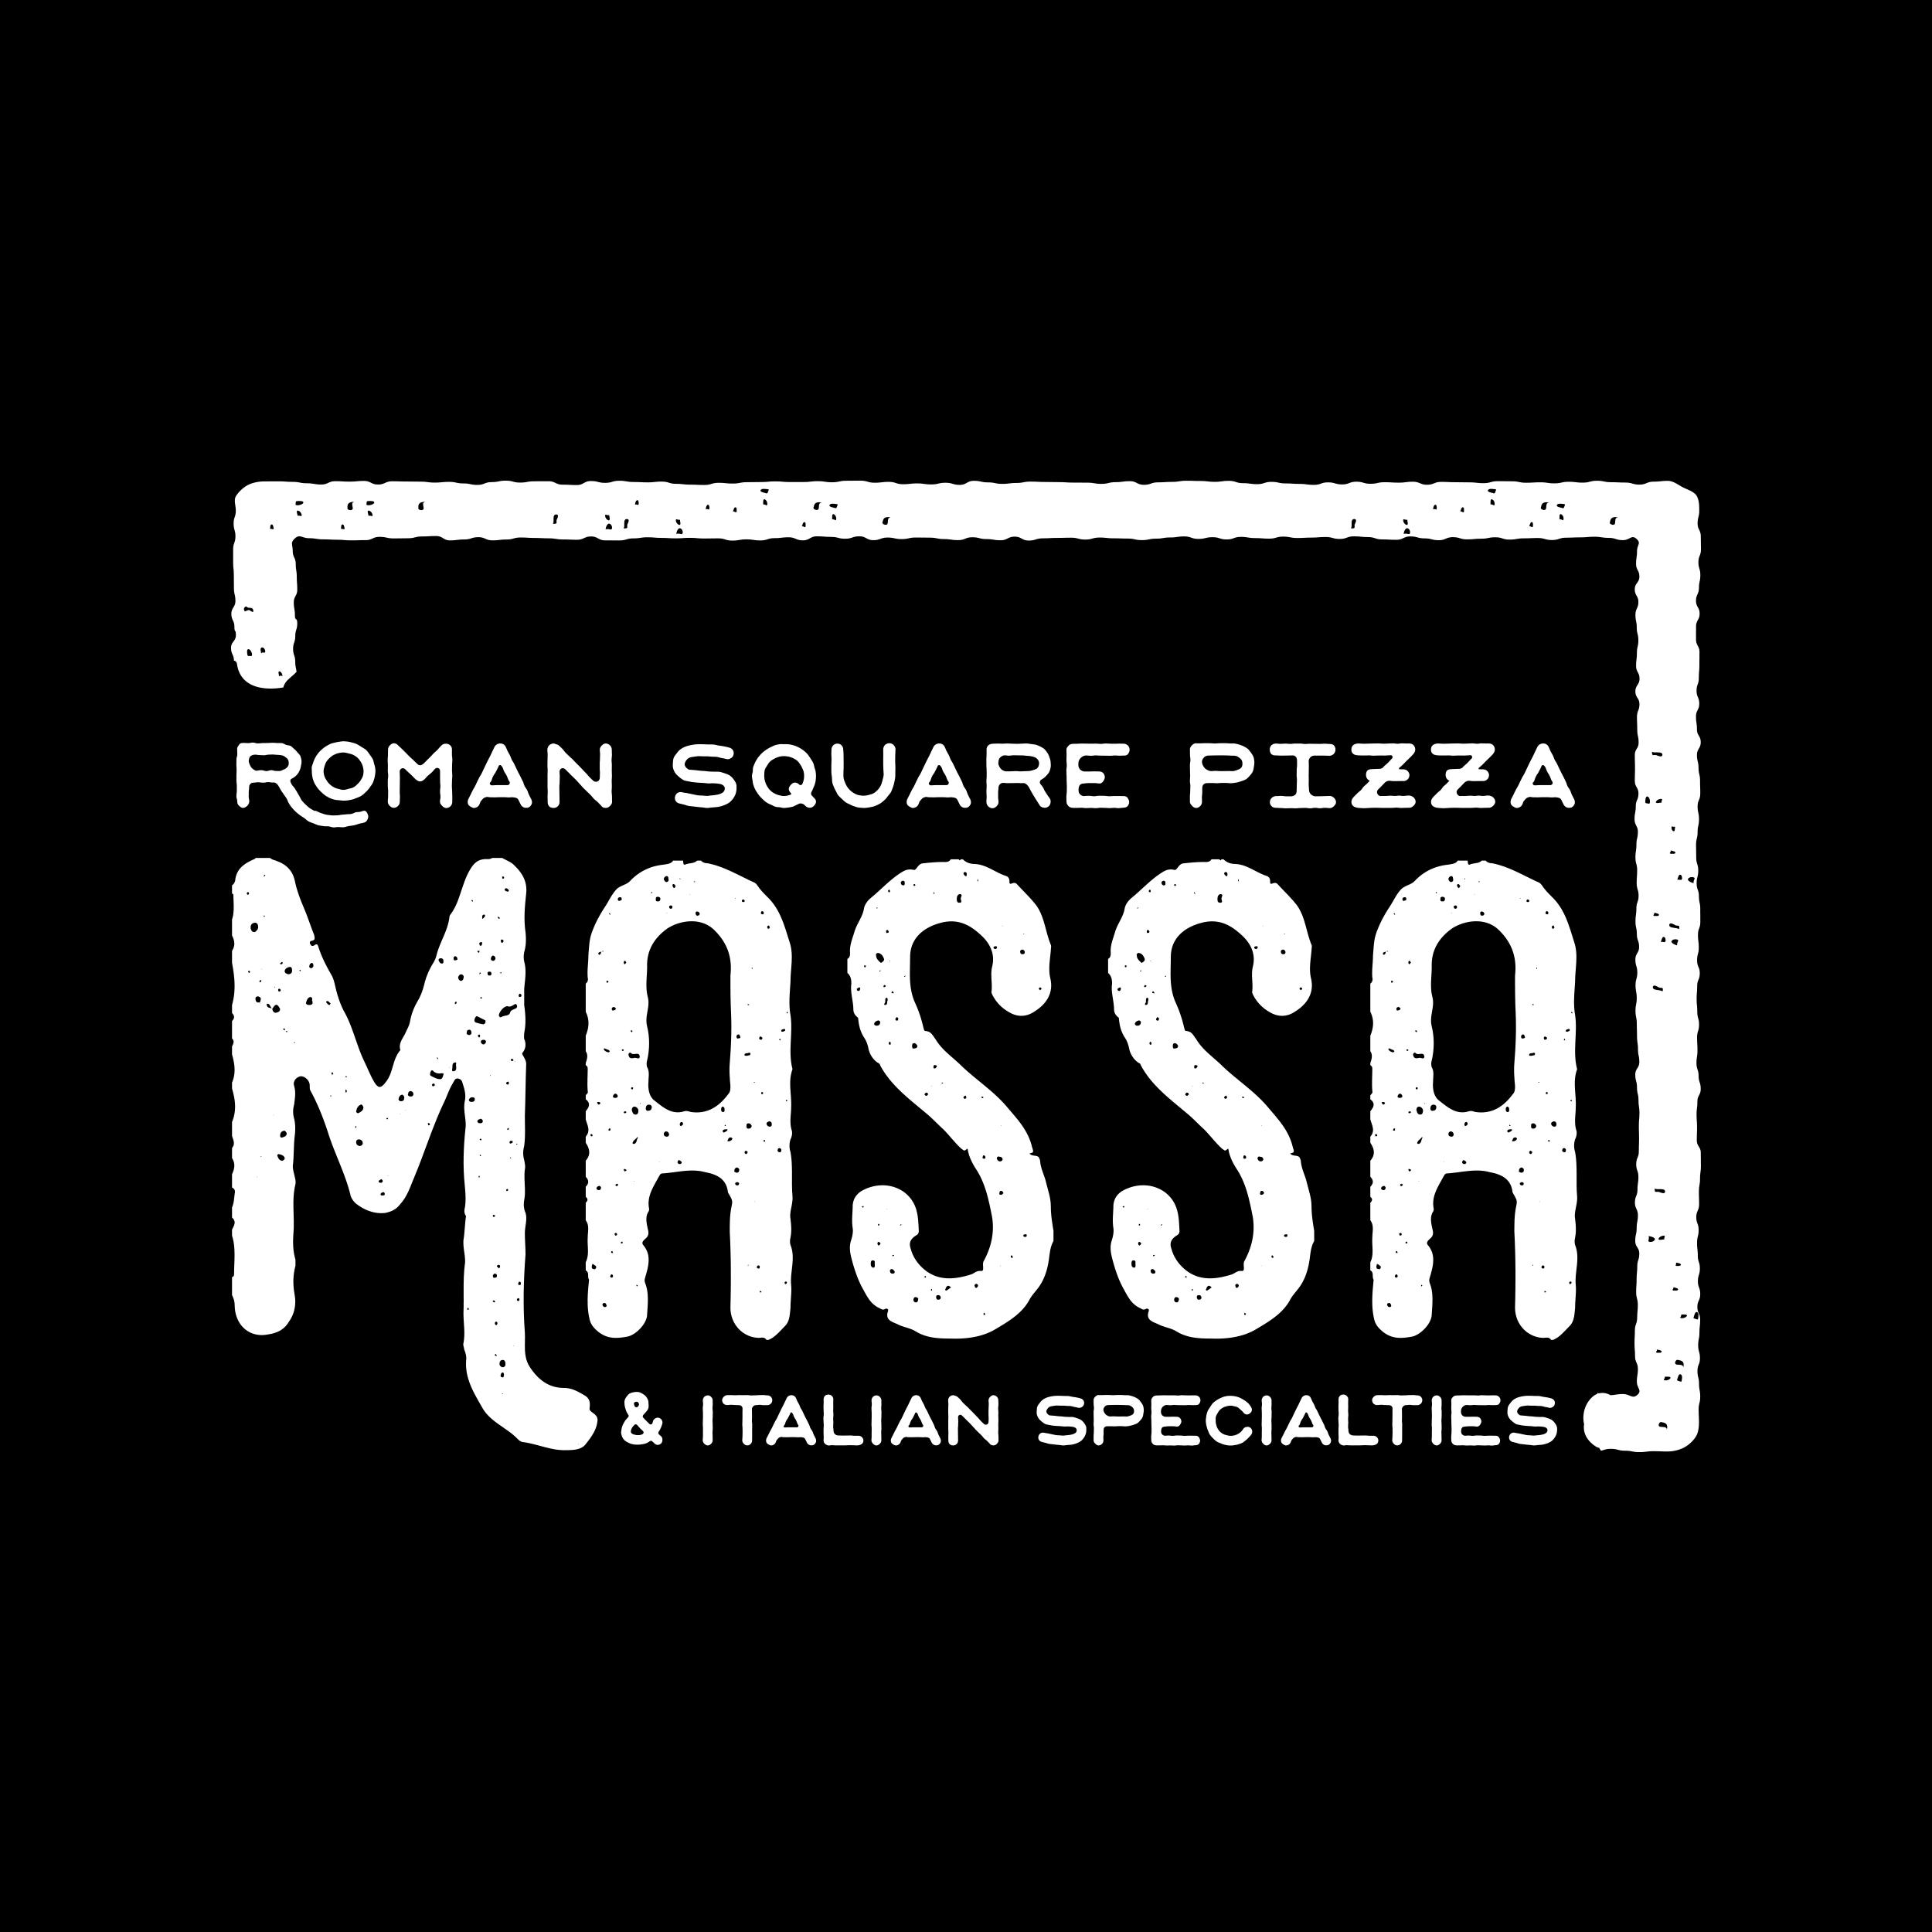 Massa_Roman_Square_Pizza_Patrice_Horvath8.jpg